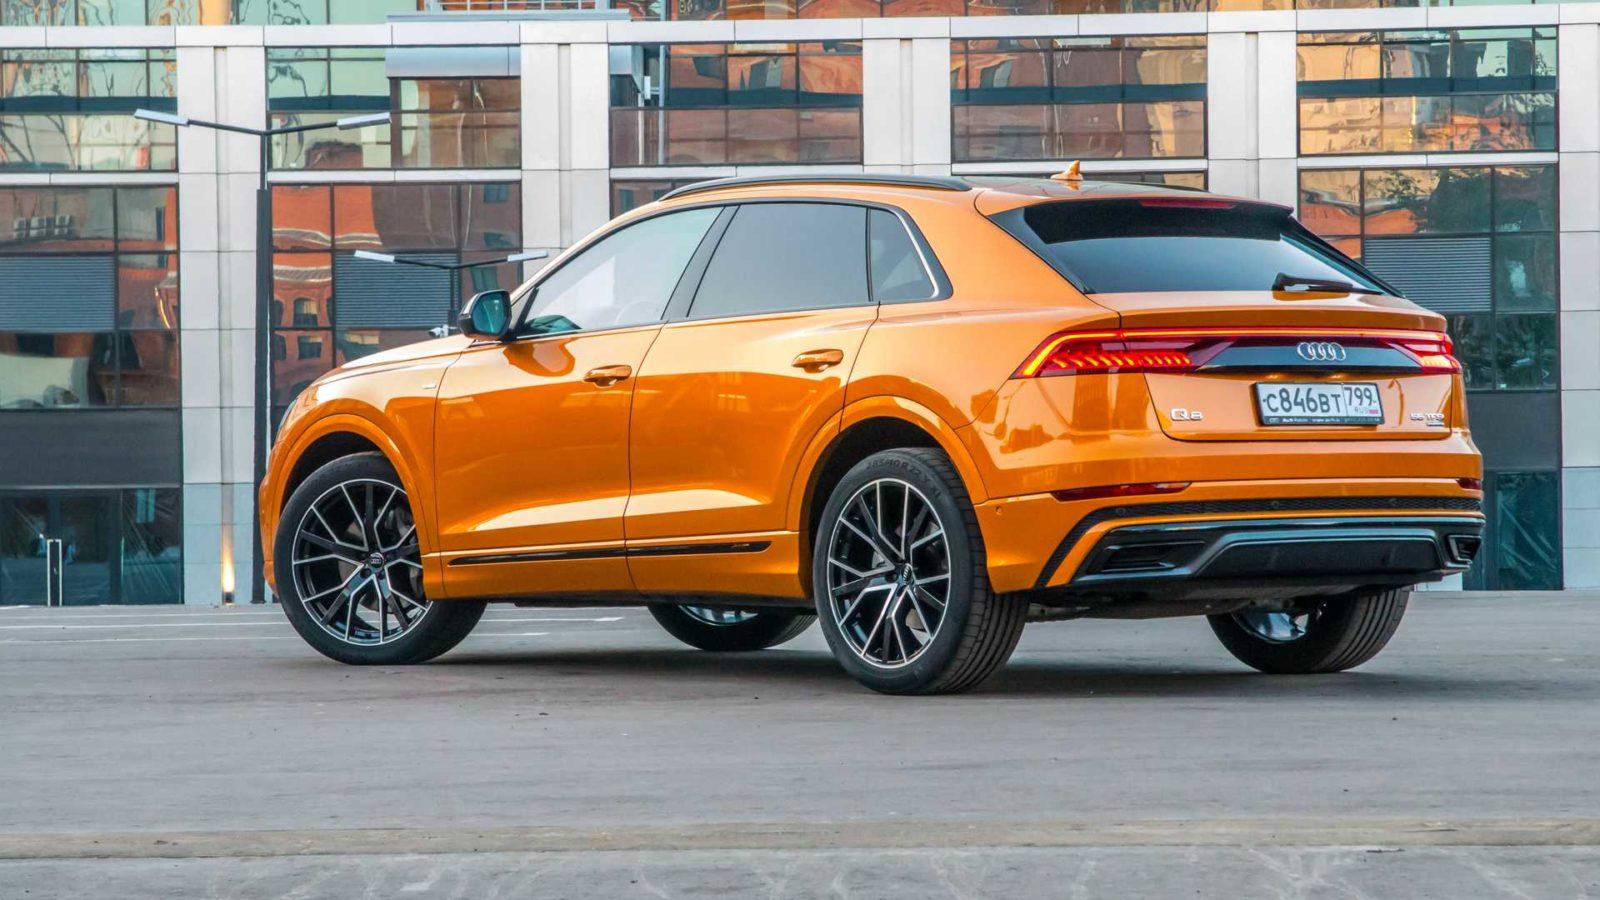 2020 Audi Q8 foto, jekster'er, vid szadi, tehnicheskie harakteristiki, cena, data vyhoda — video